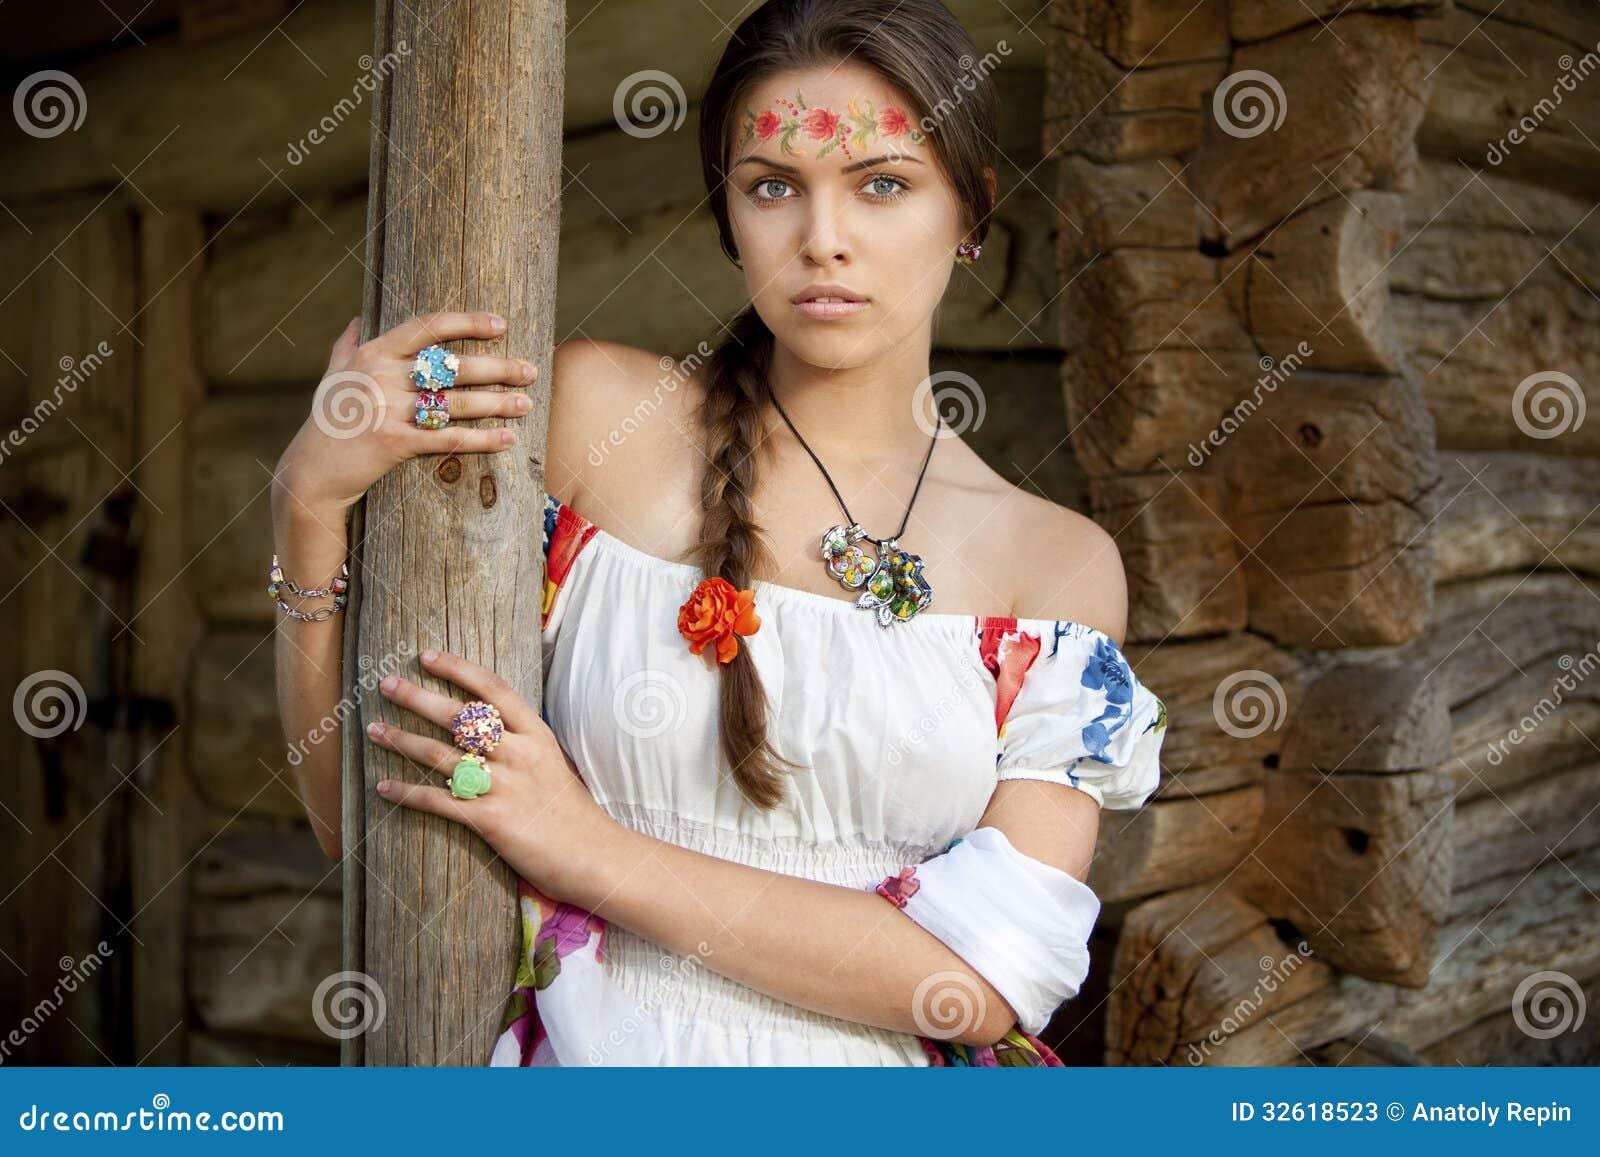 sites-ukrainian-brunette-teen-found